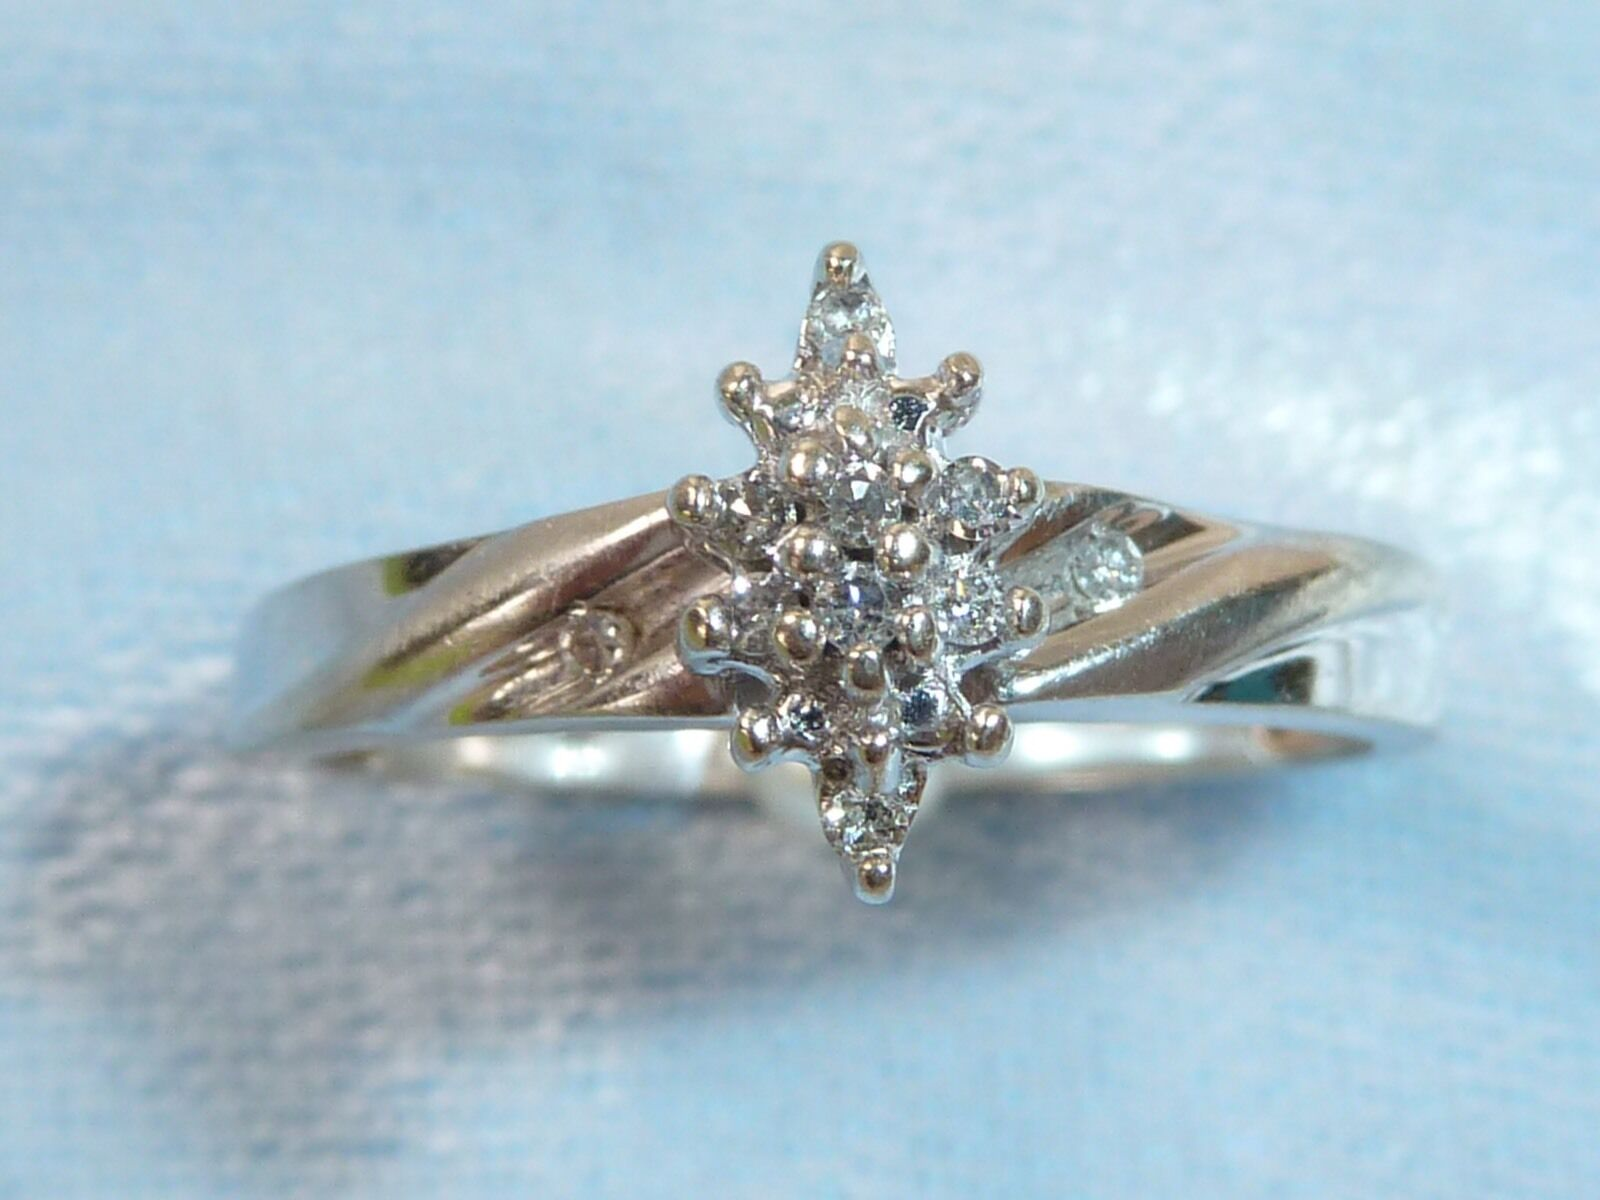 10K White gold Ring, 14, 1.25mm Diamonds, TCW .14 Carat,  Size 8-1 4